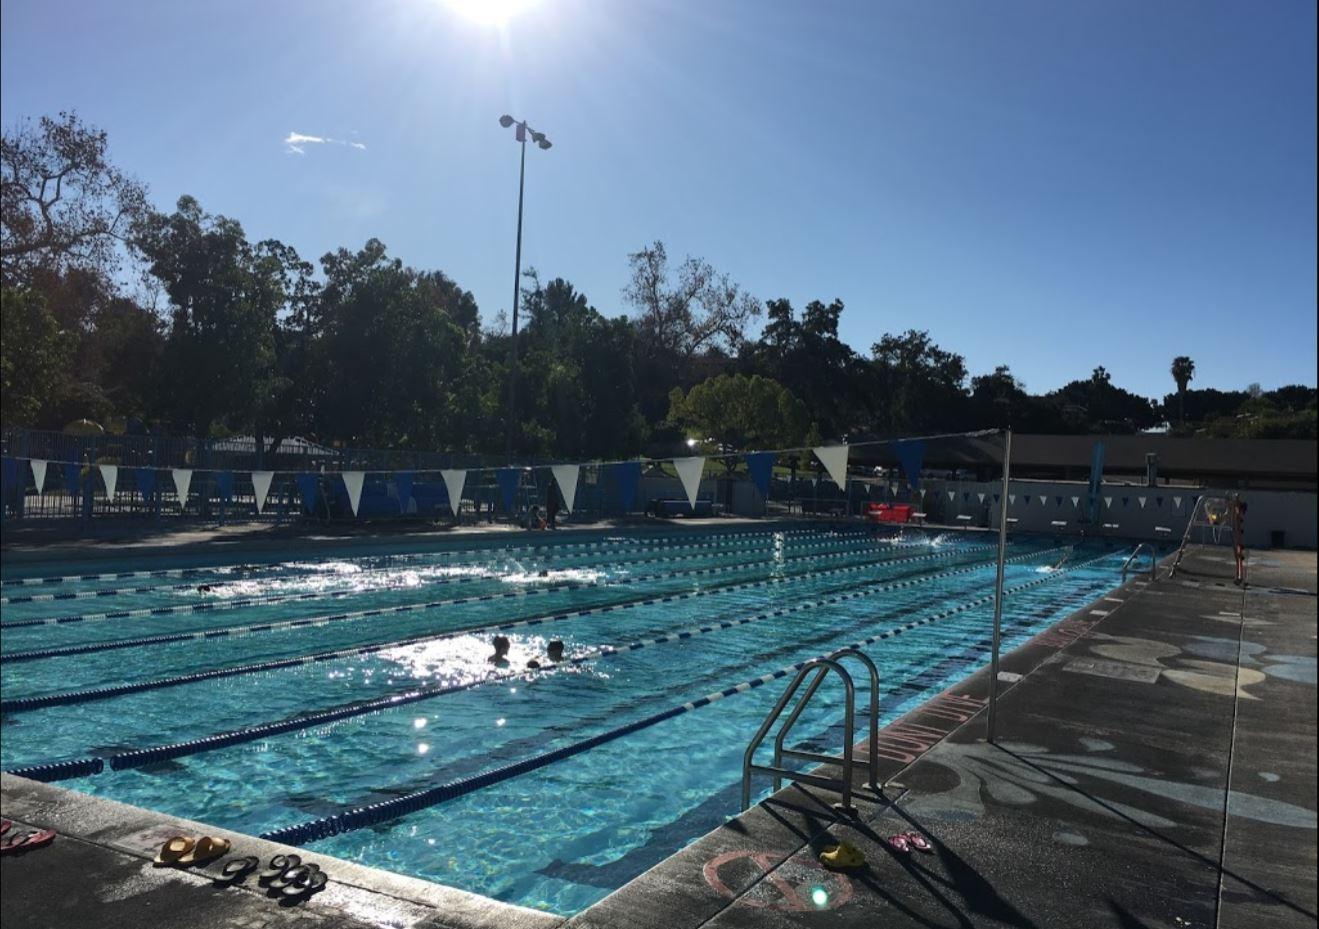 Barnes Park Pool